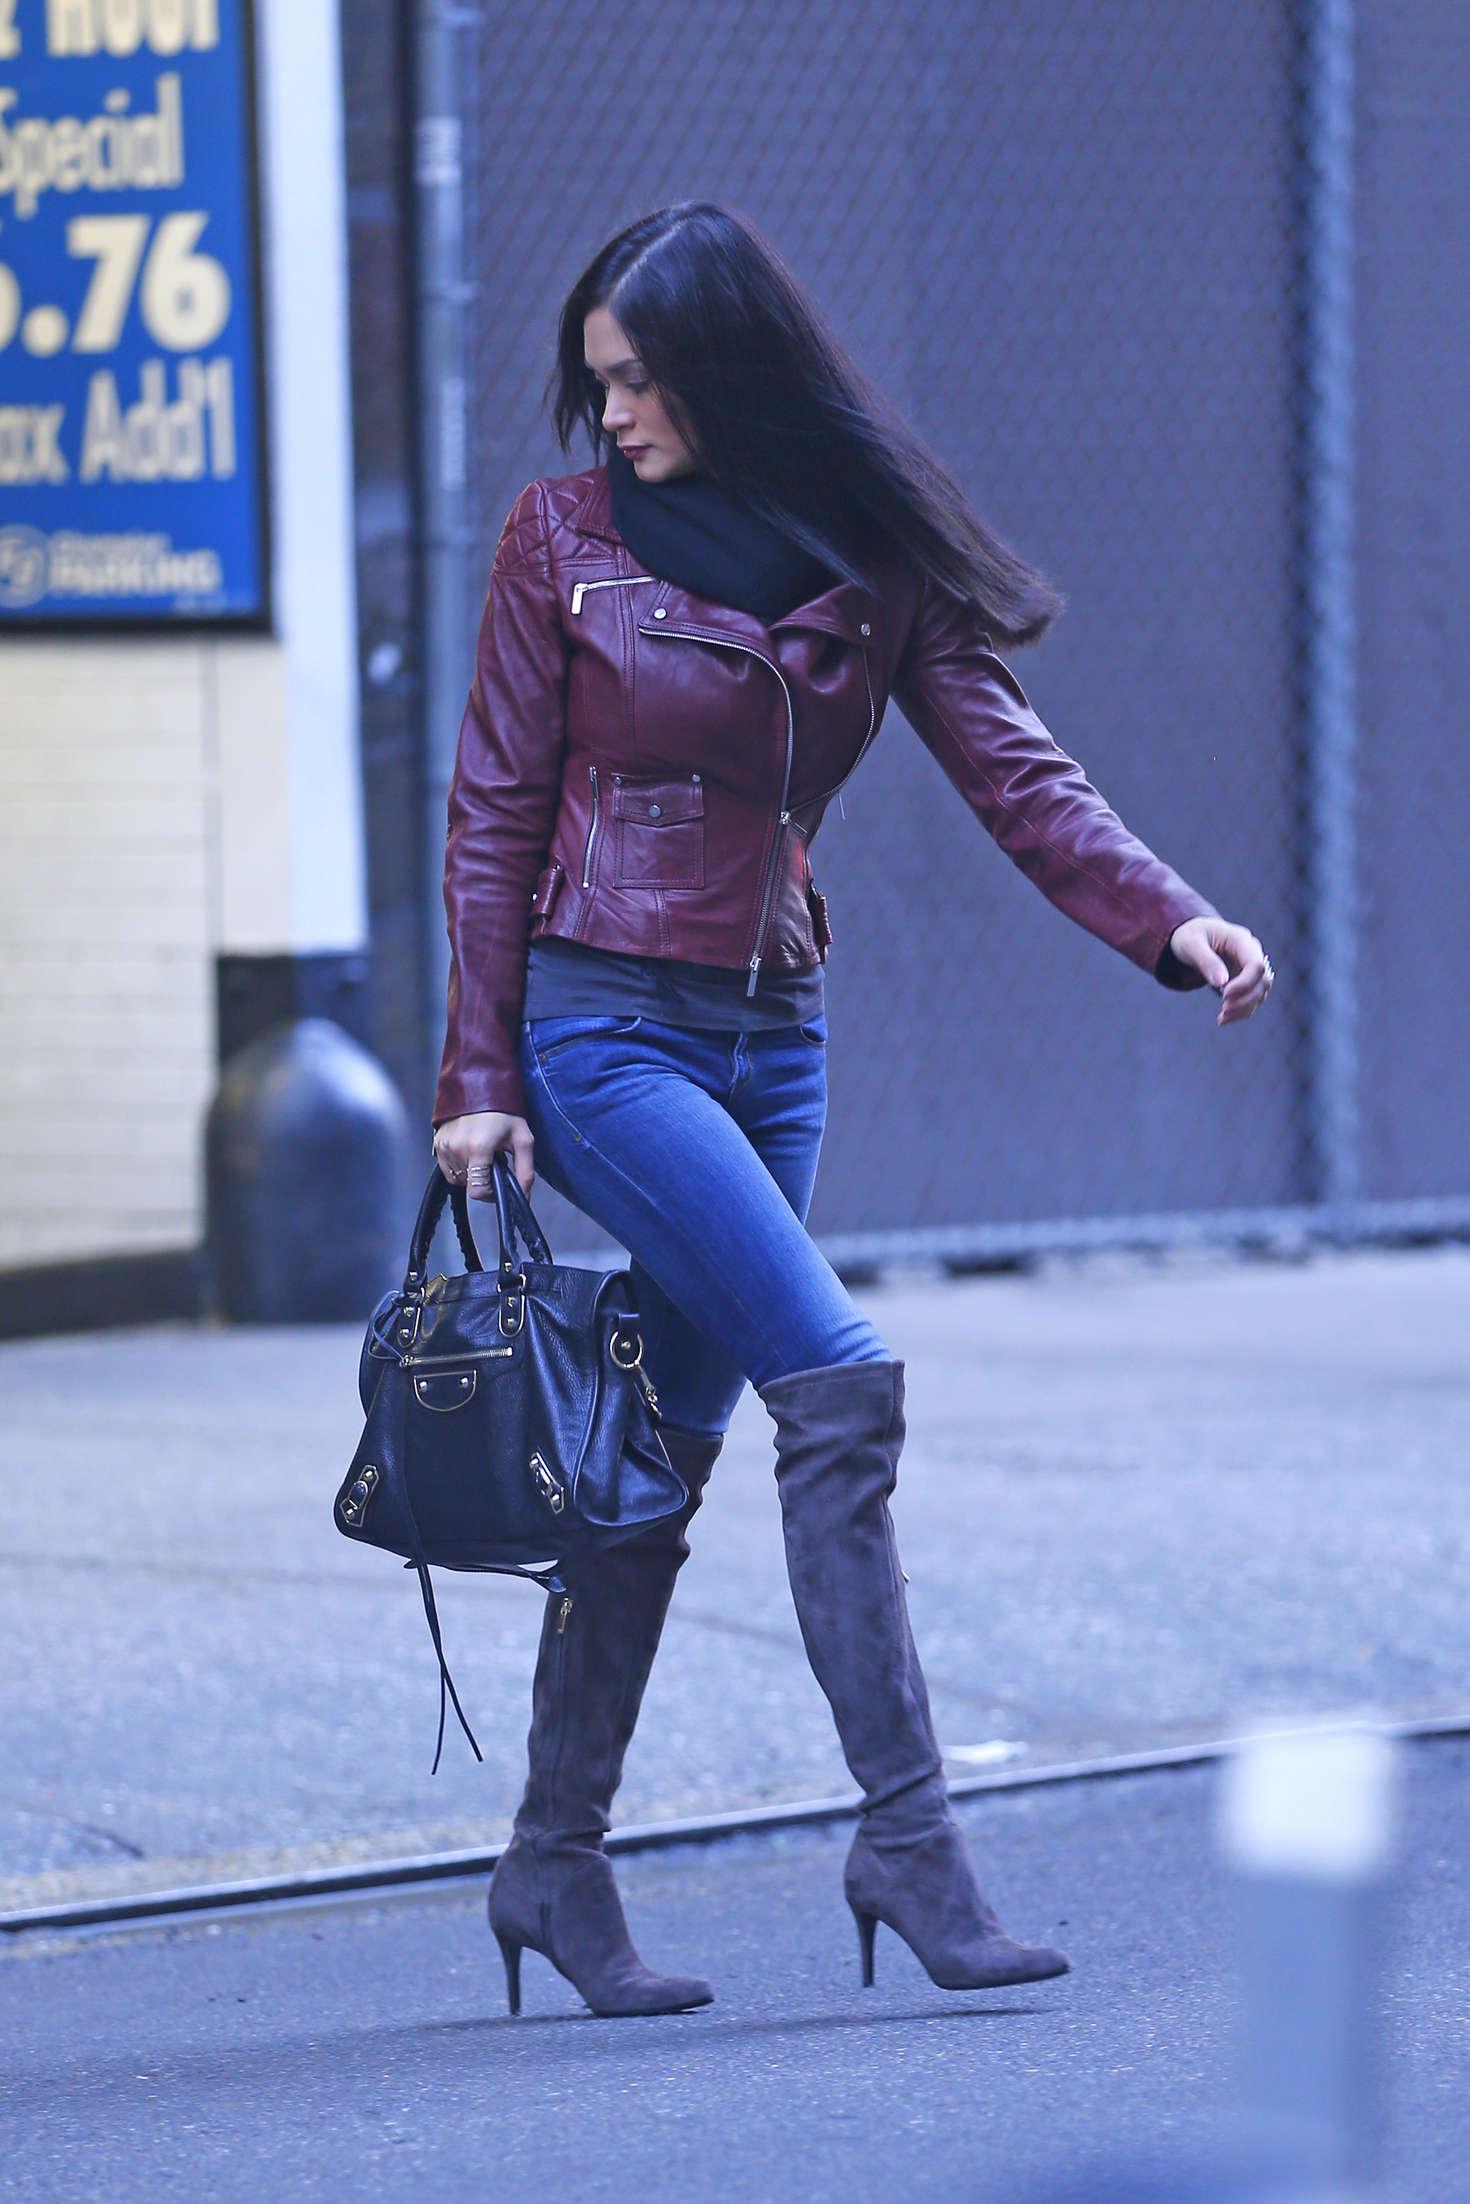 Pia alonzo wurtzbach botty in jeans 11 gotceleb for 24 hour tanning salon nyc